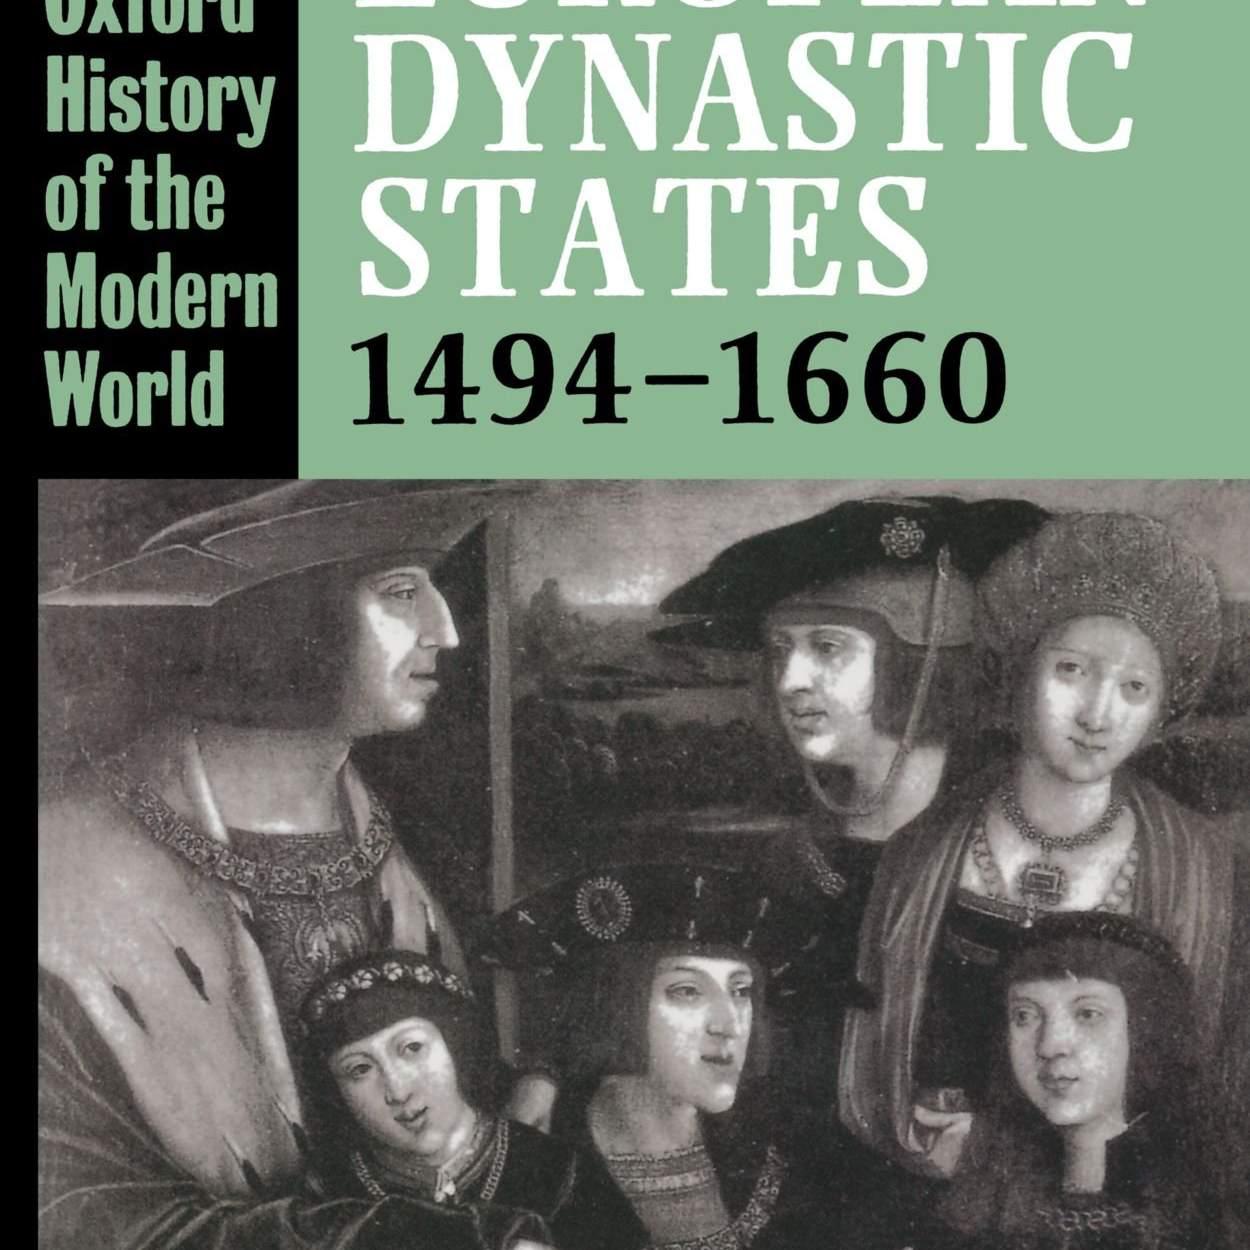 The European Dynastic States by Richard Bonney